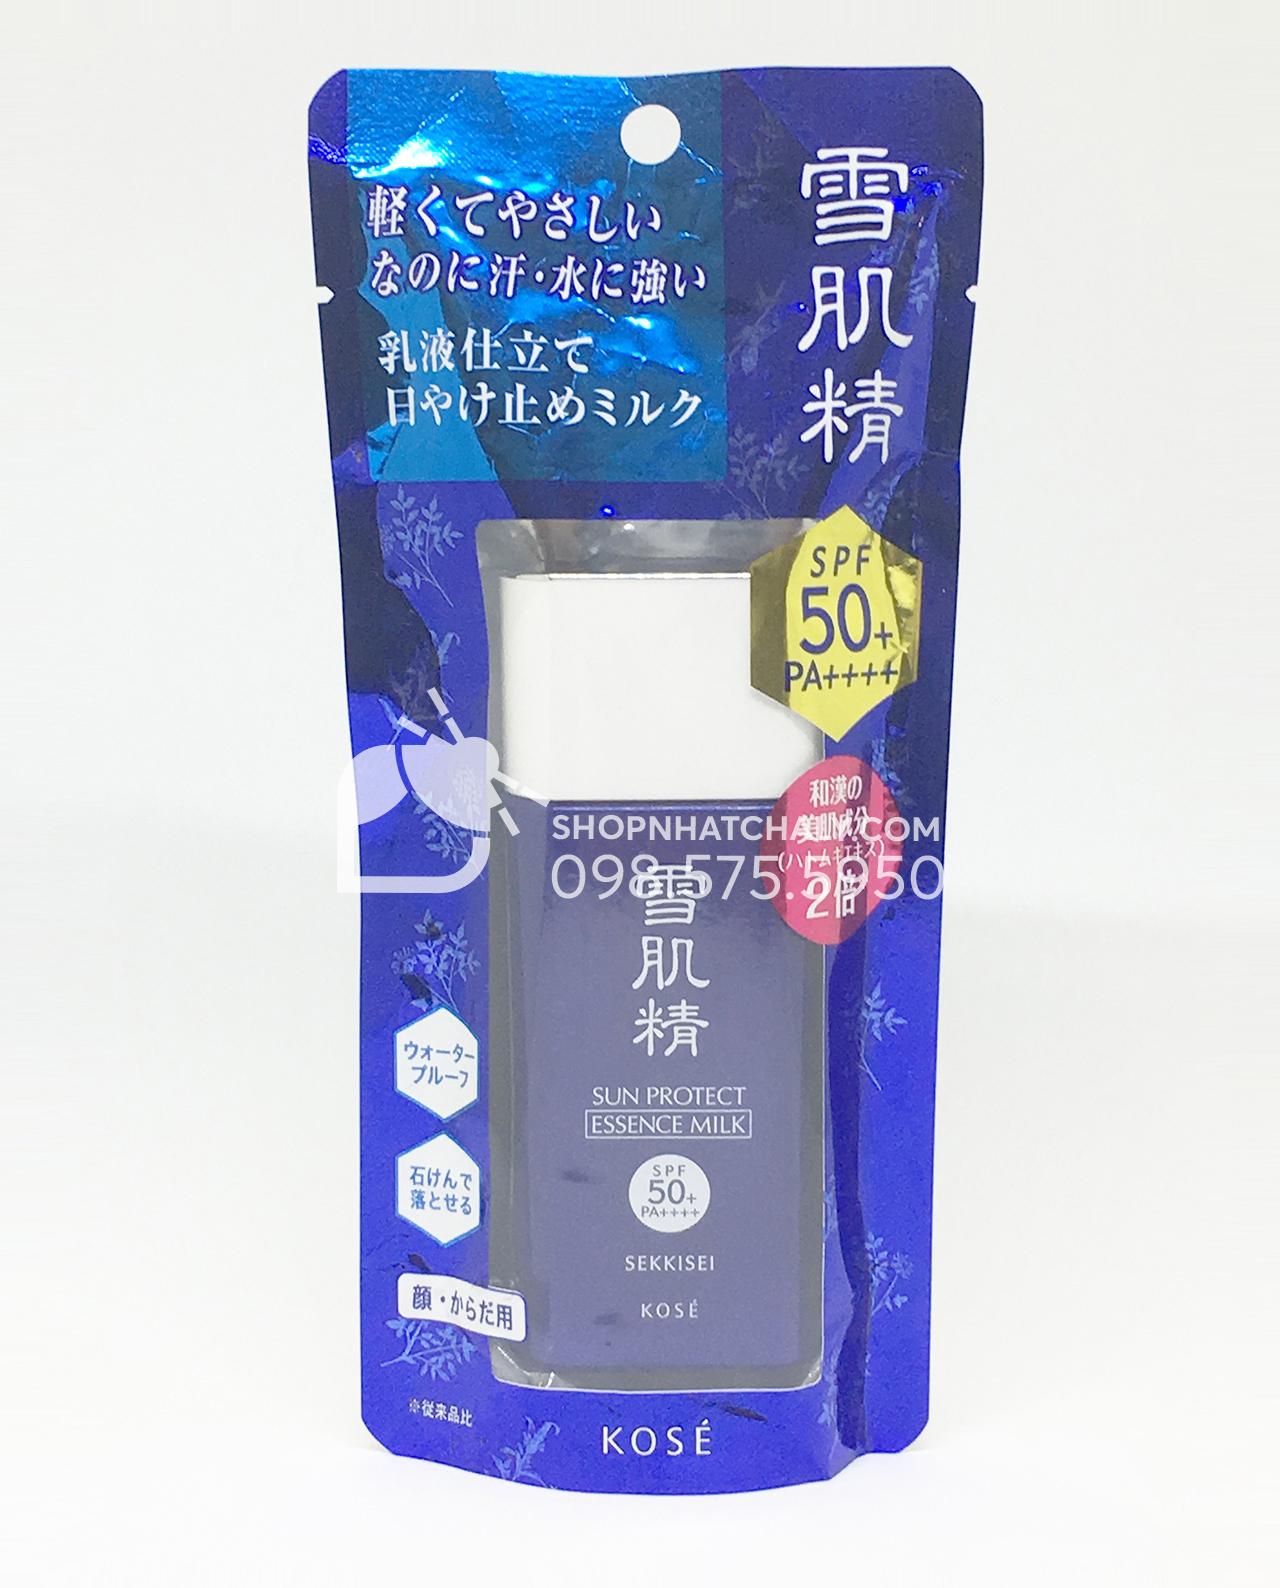 Kem chống nắng dành cho da mặt Kose Sekkisei Sun Protect Essence Milk SPF 50 60gr